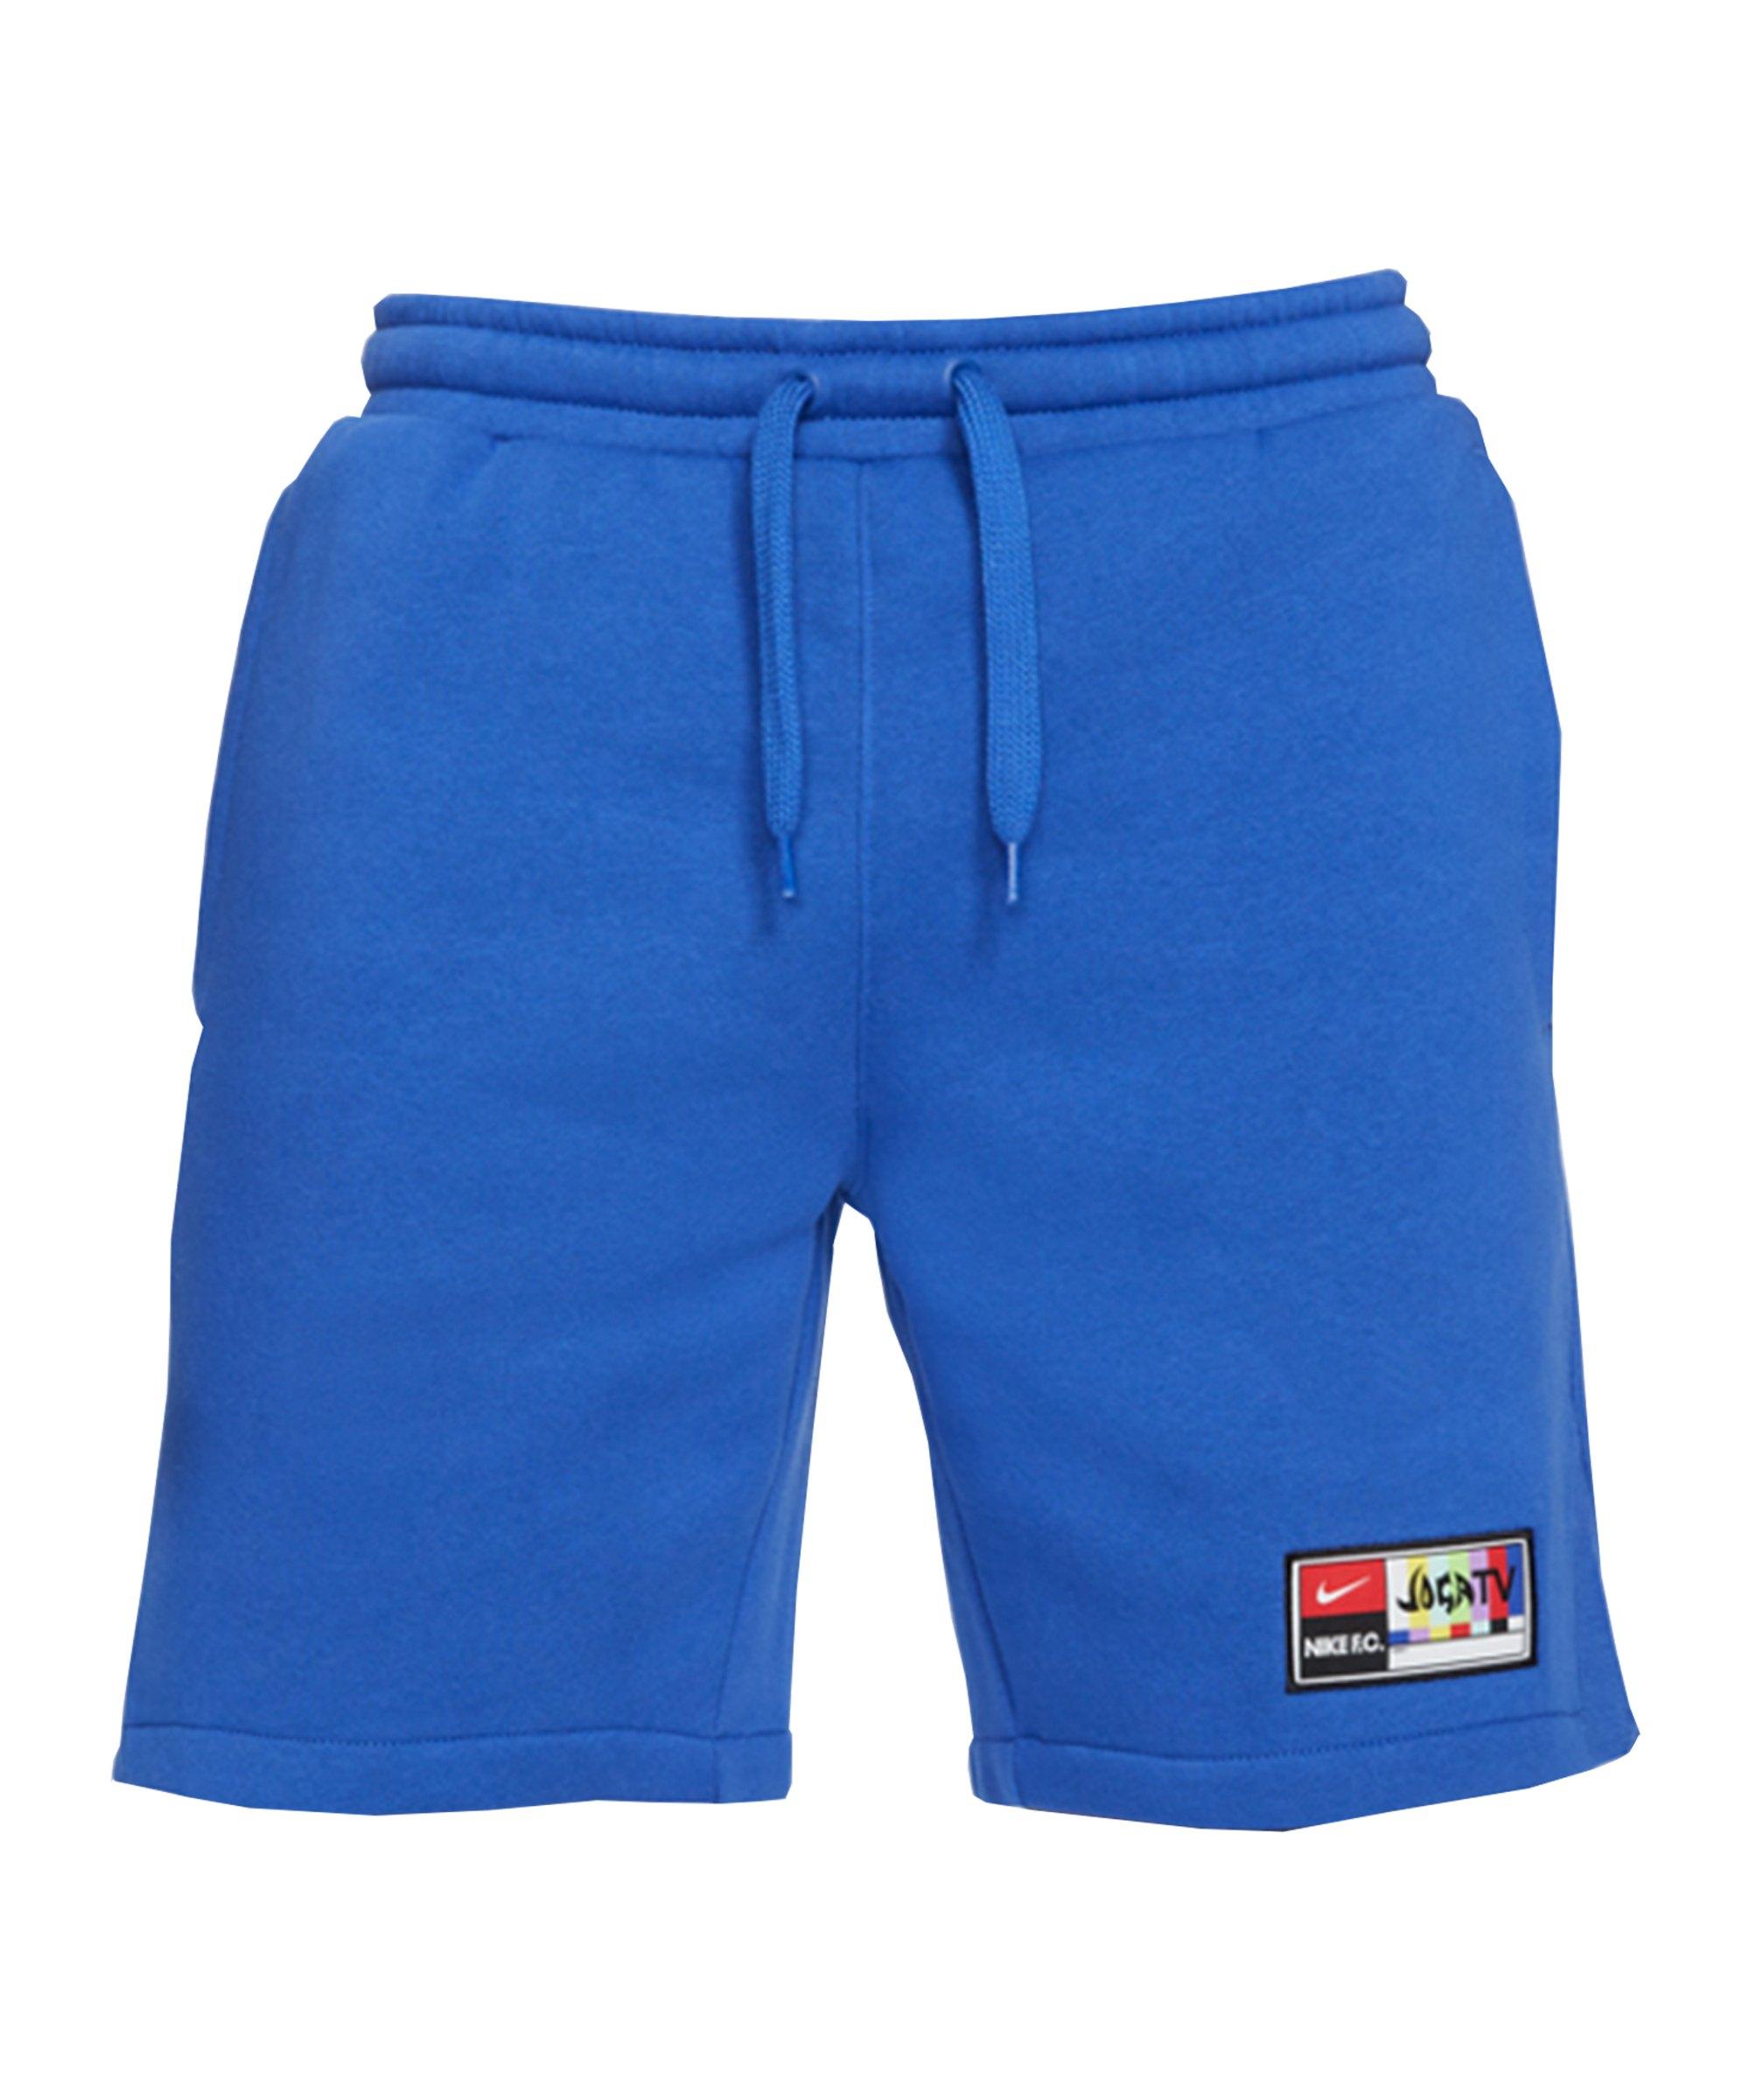 Nike F.C. Joga Bonito Fleece Short Blau F480 - blau